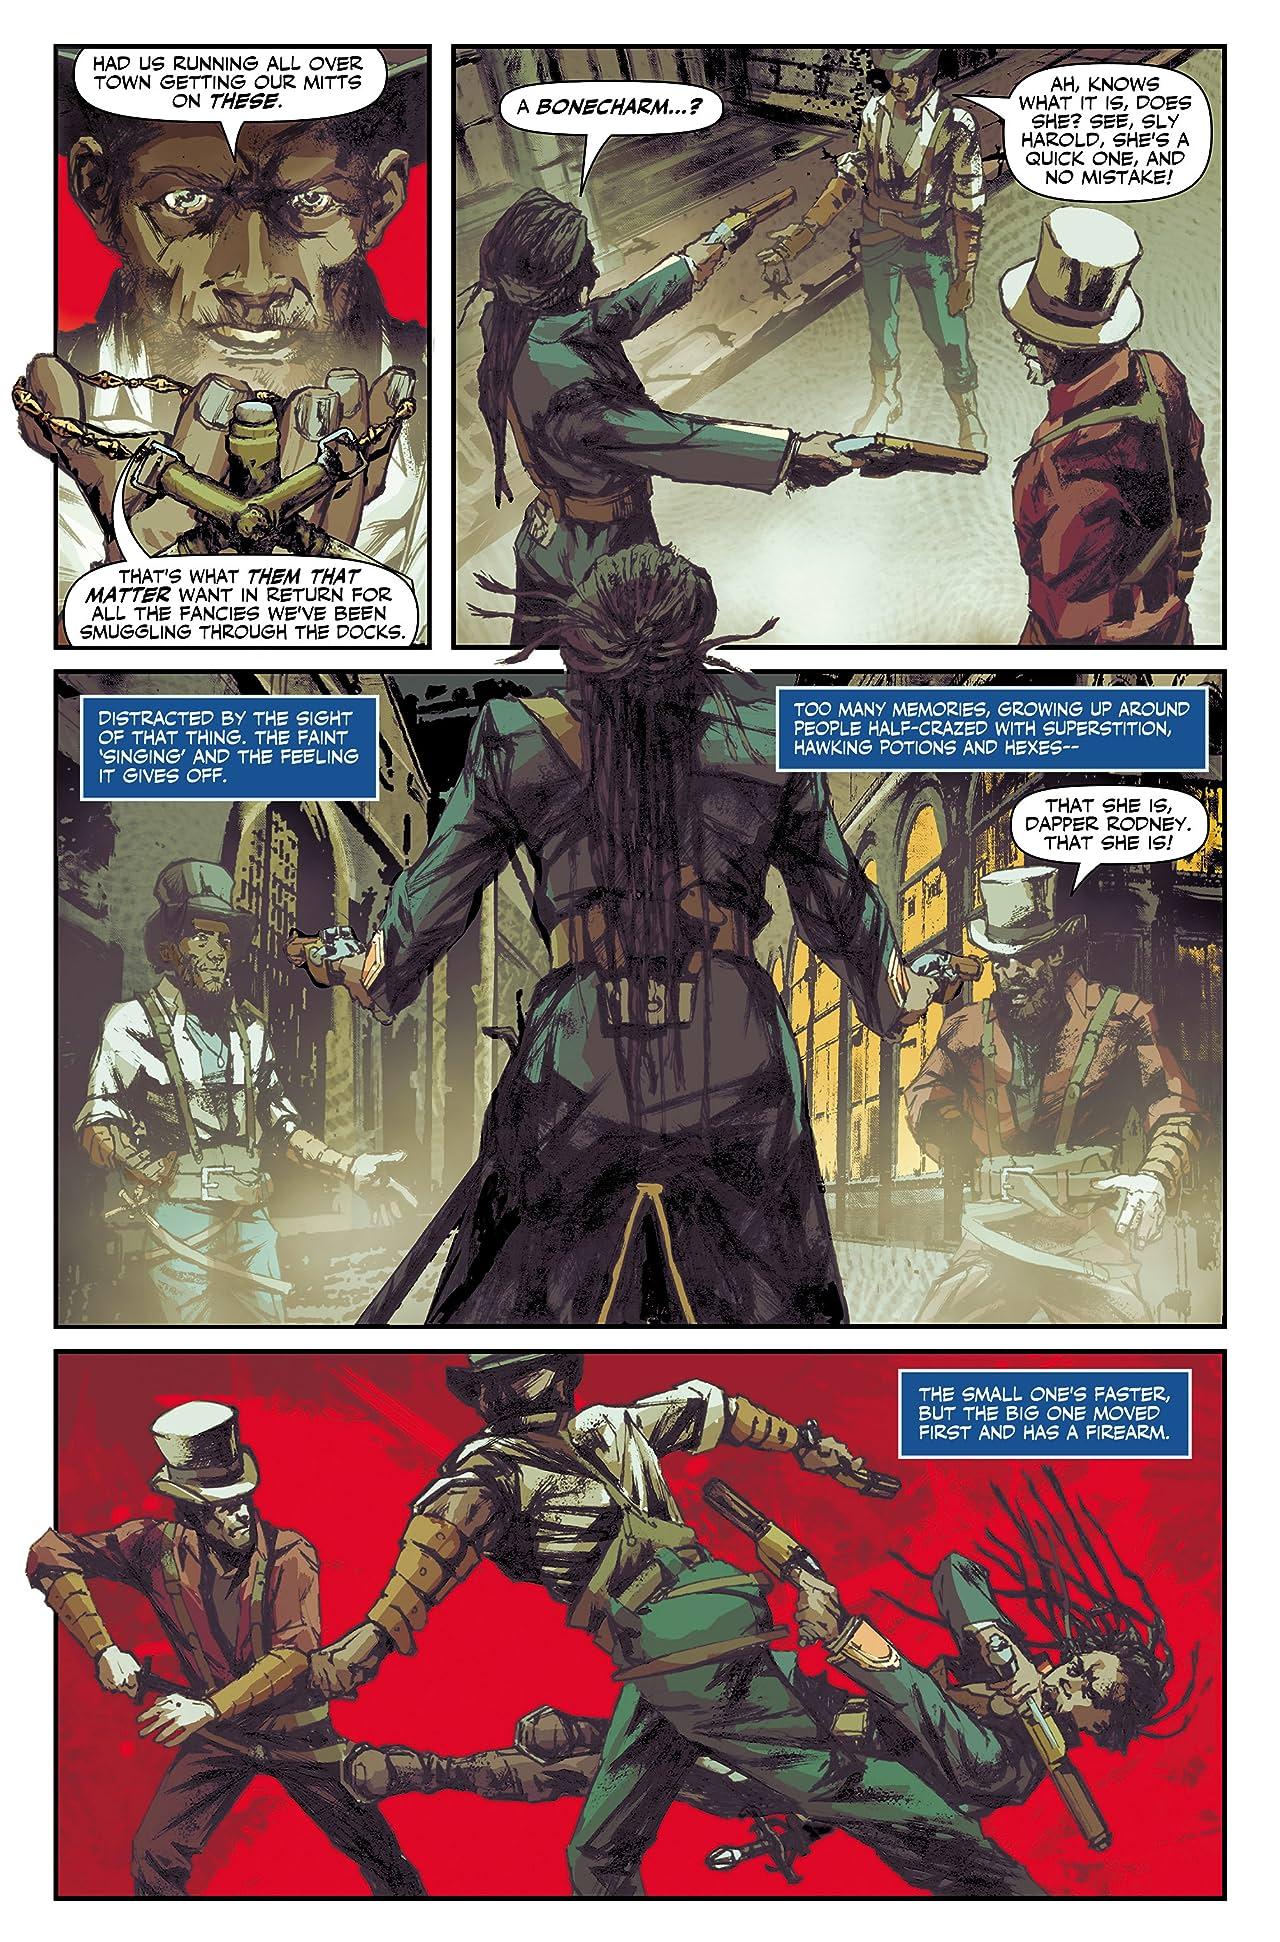 Dishonored #4